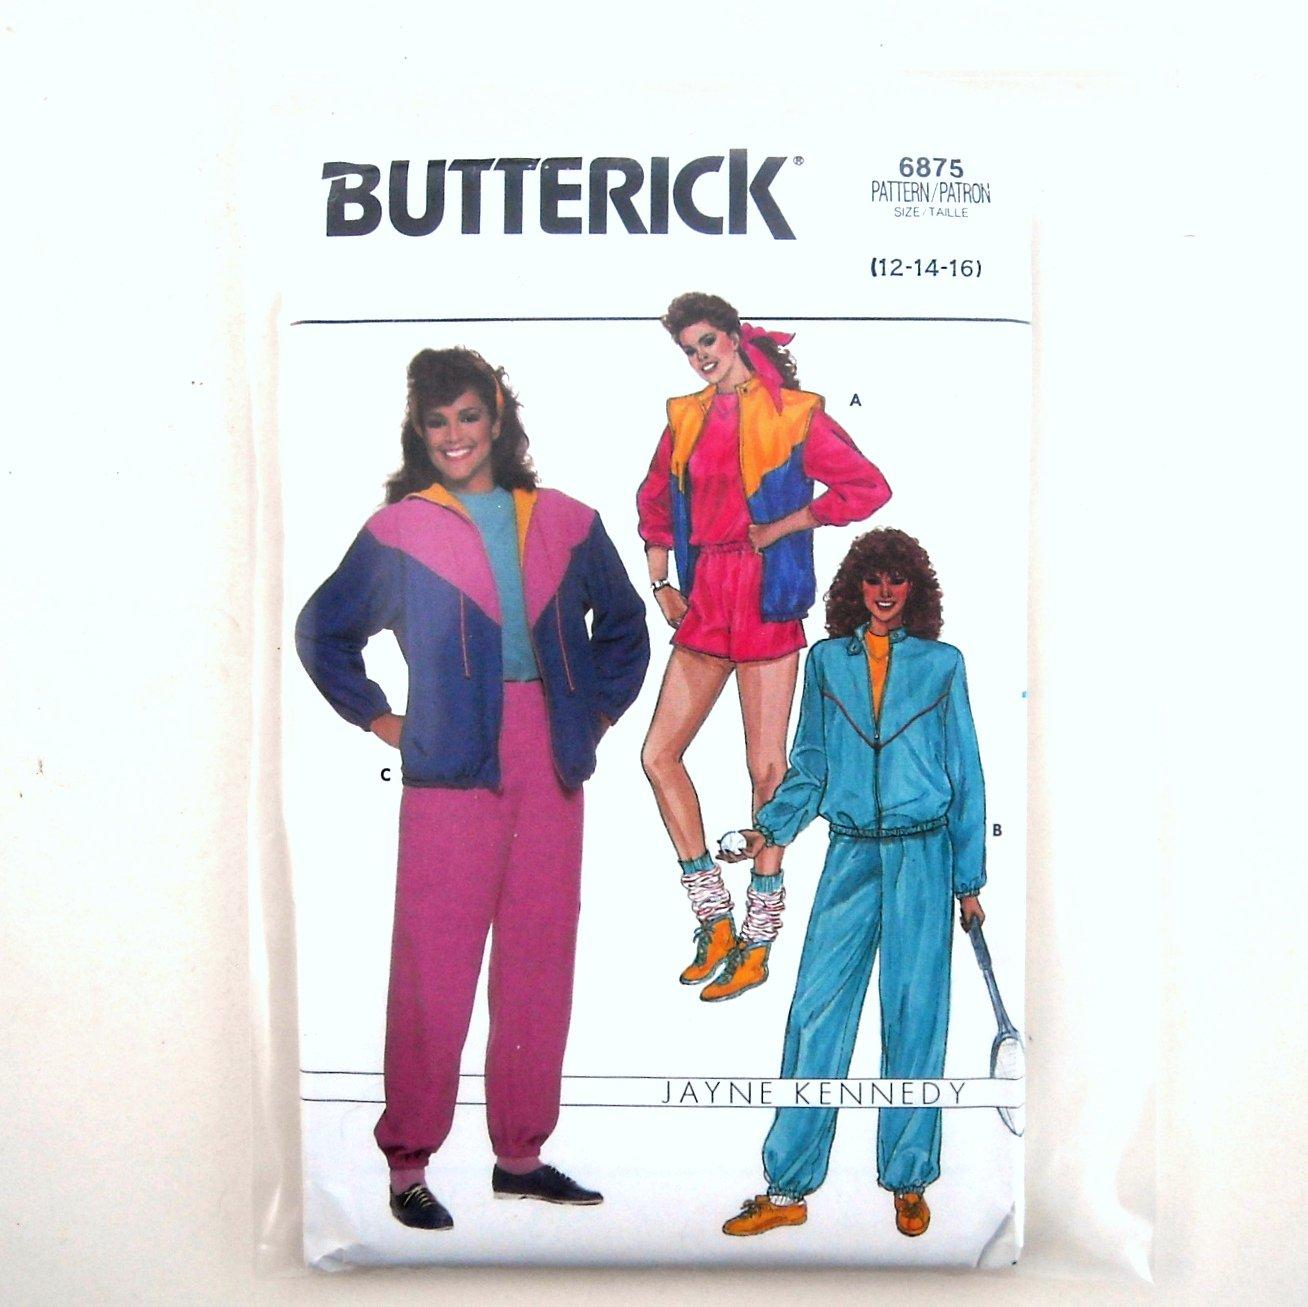 Jacket Vest Shorts Pants Top Misses Size 12 - 16 Vintage Butterick Sewing Pattern 6875